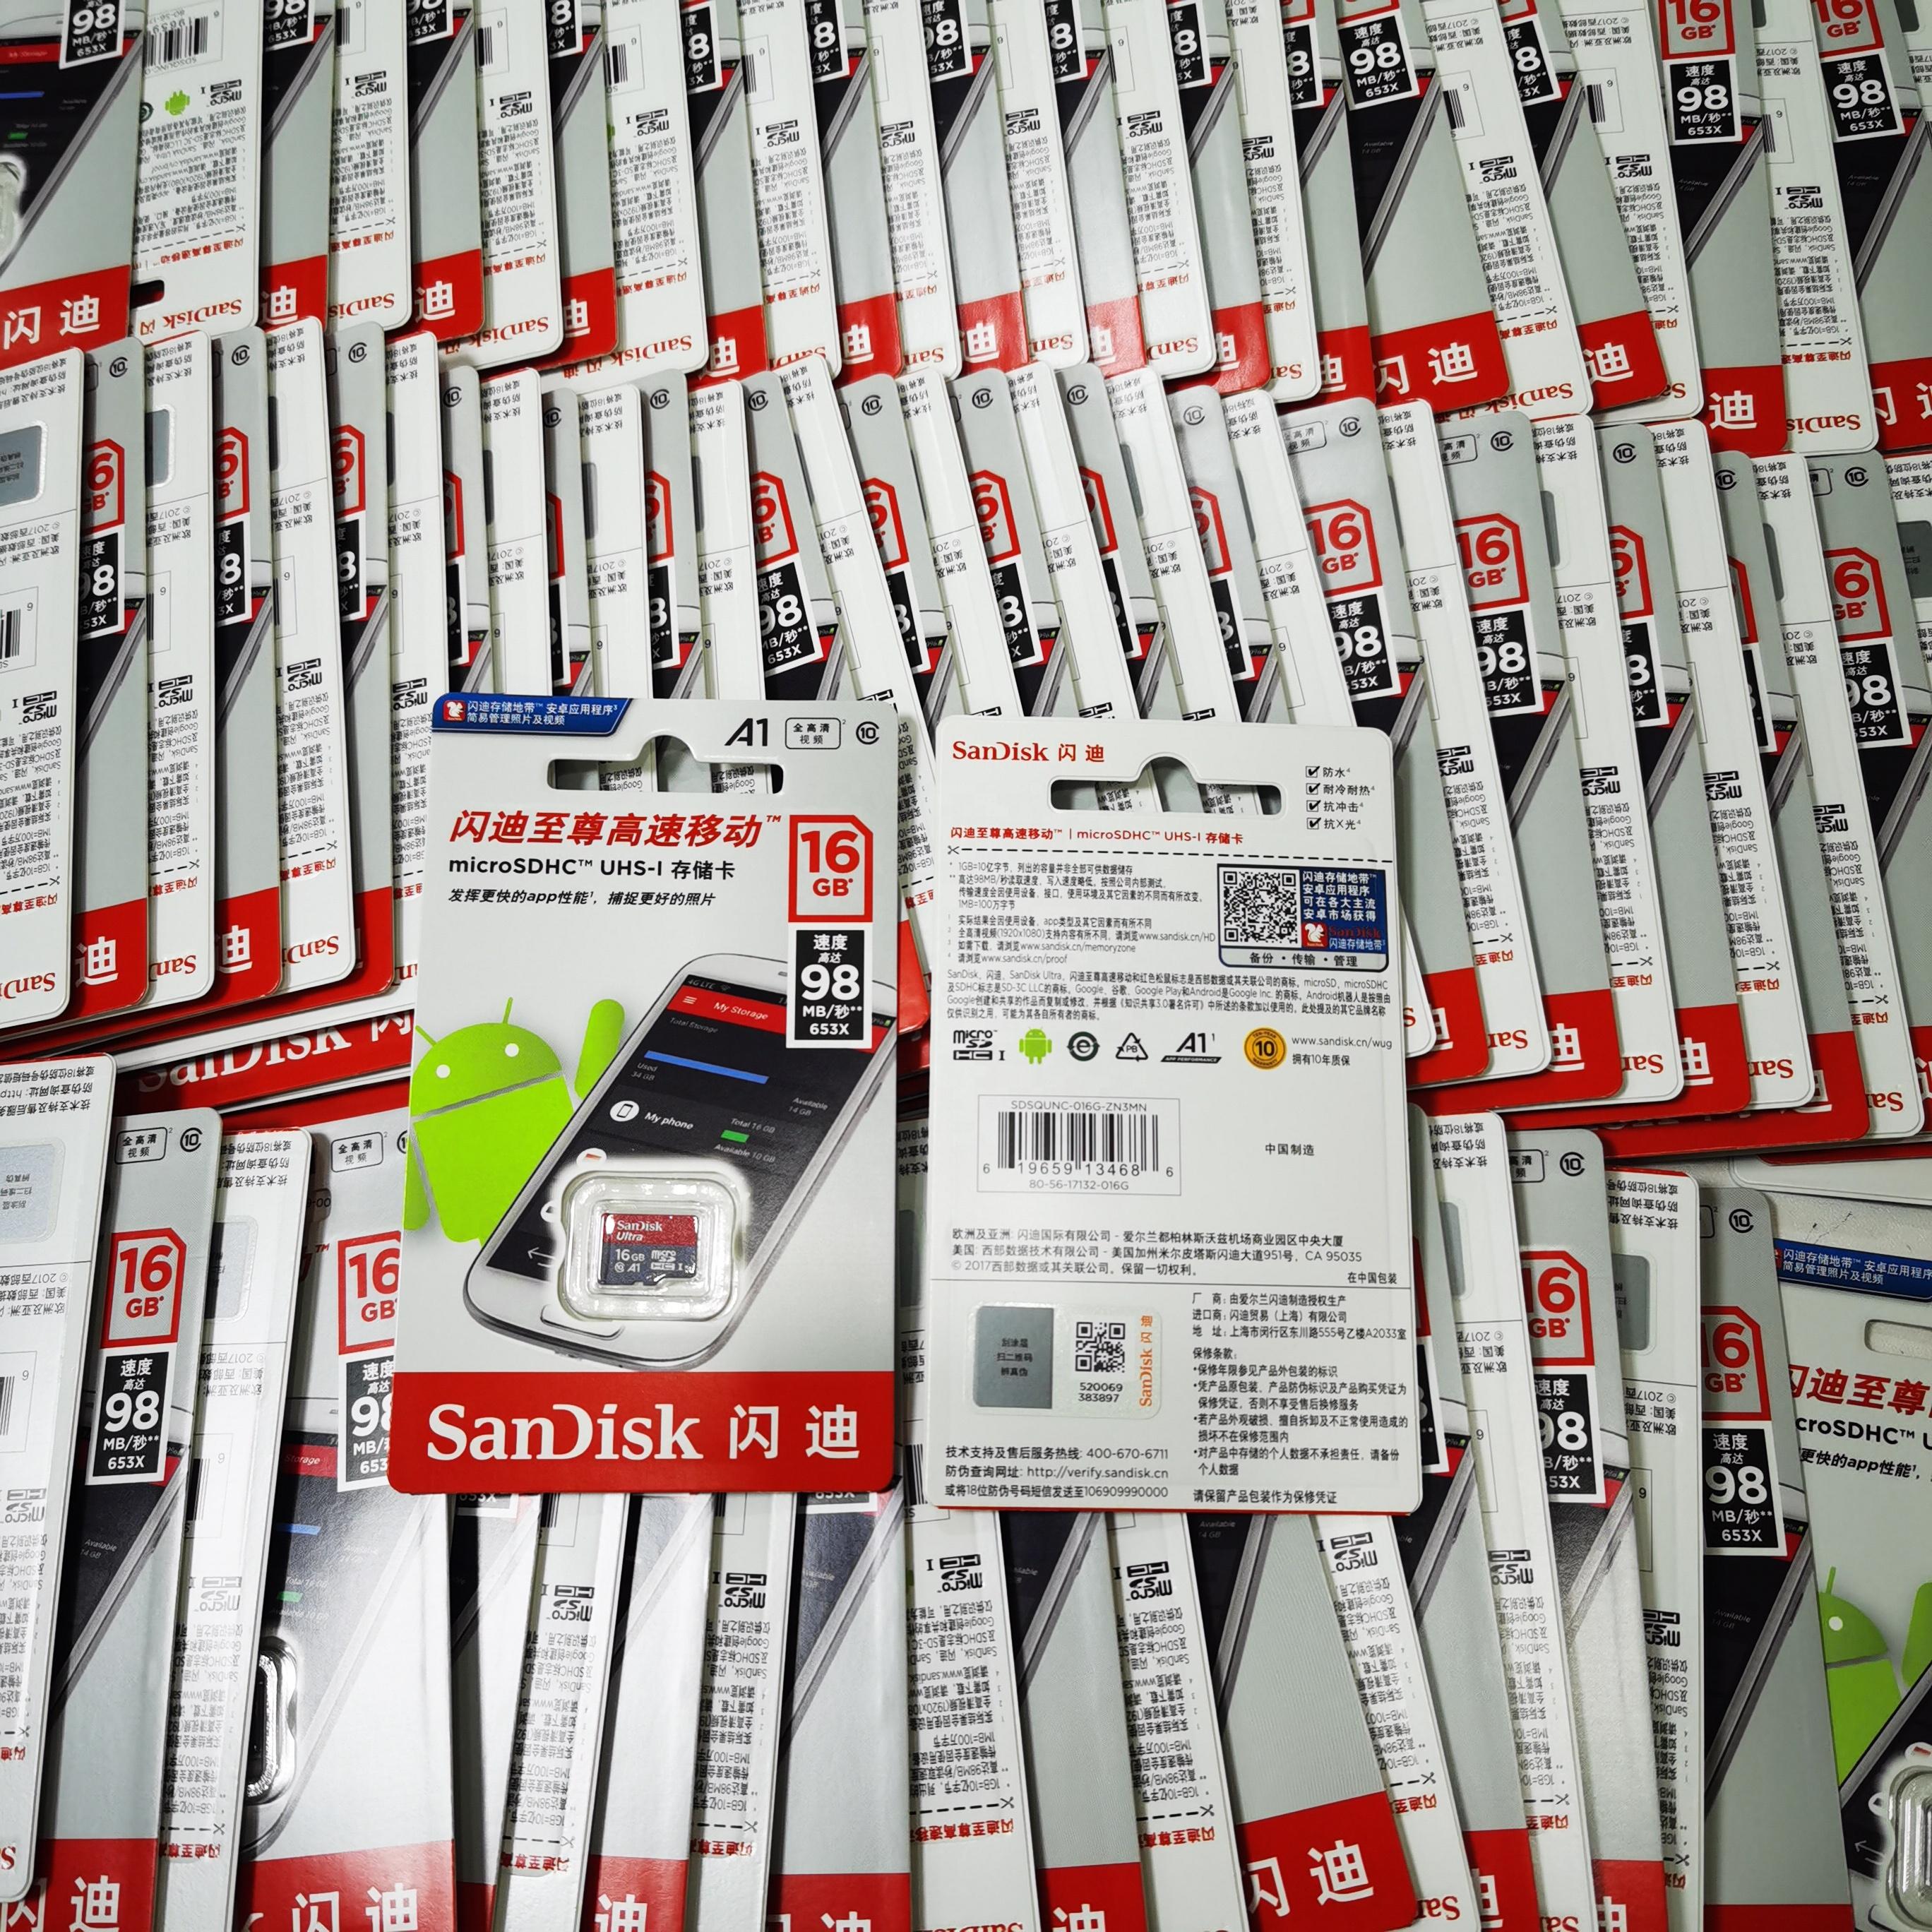 100% Original Sandisk Micro SD Card 128GB 32GB 256GB 16G 400GB Micro SD/TF Card Ultra Class 10 A1 Memory Card 64gb for Phone